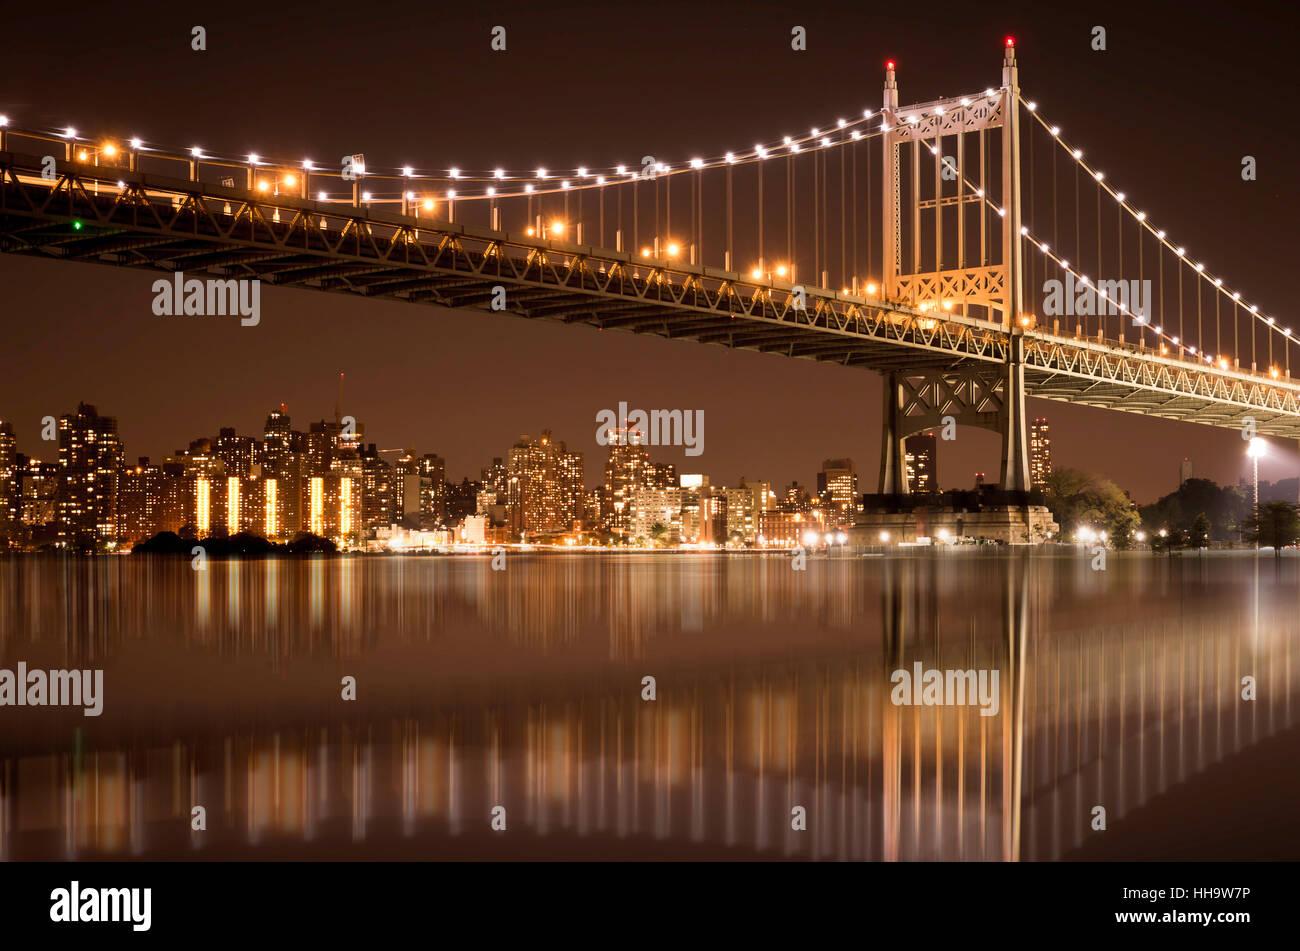 Beautiful night view of New York City with lights of Robert F. Kennedy RFK bridge aka the Triborough bridge - Stock Image